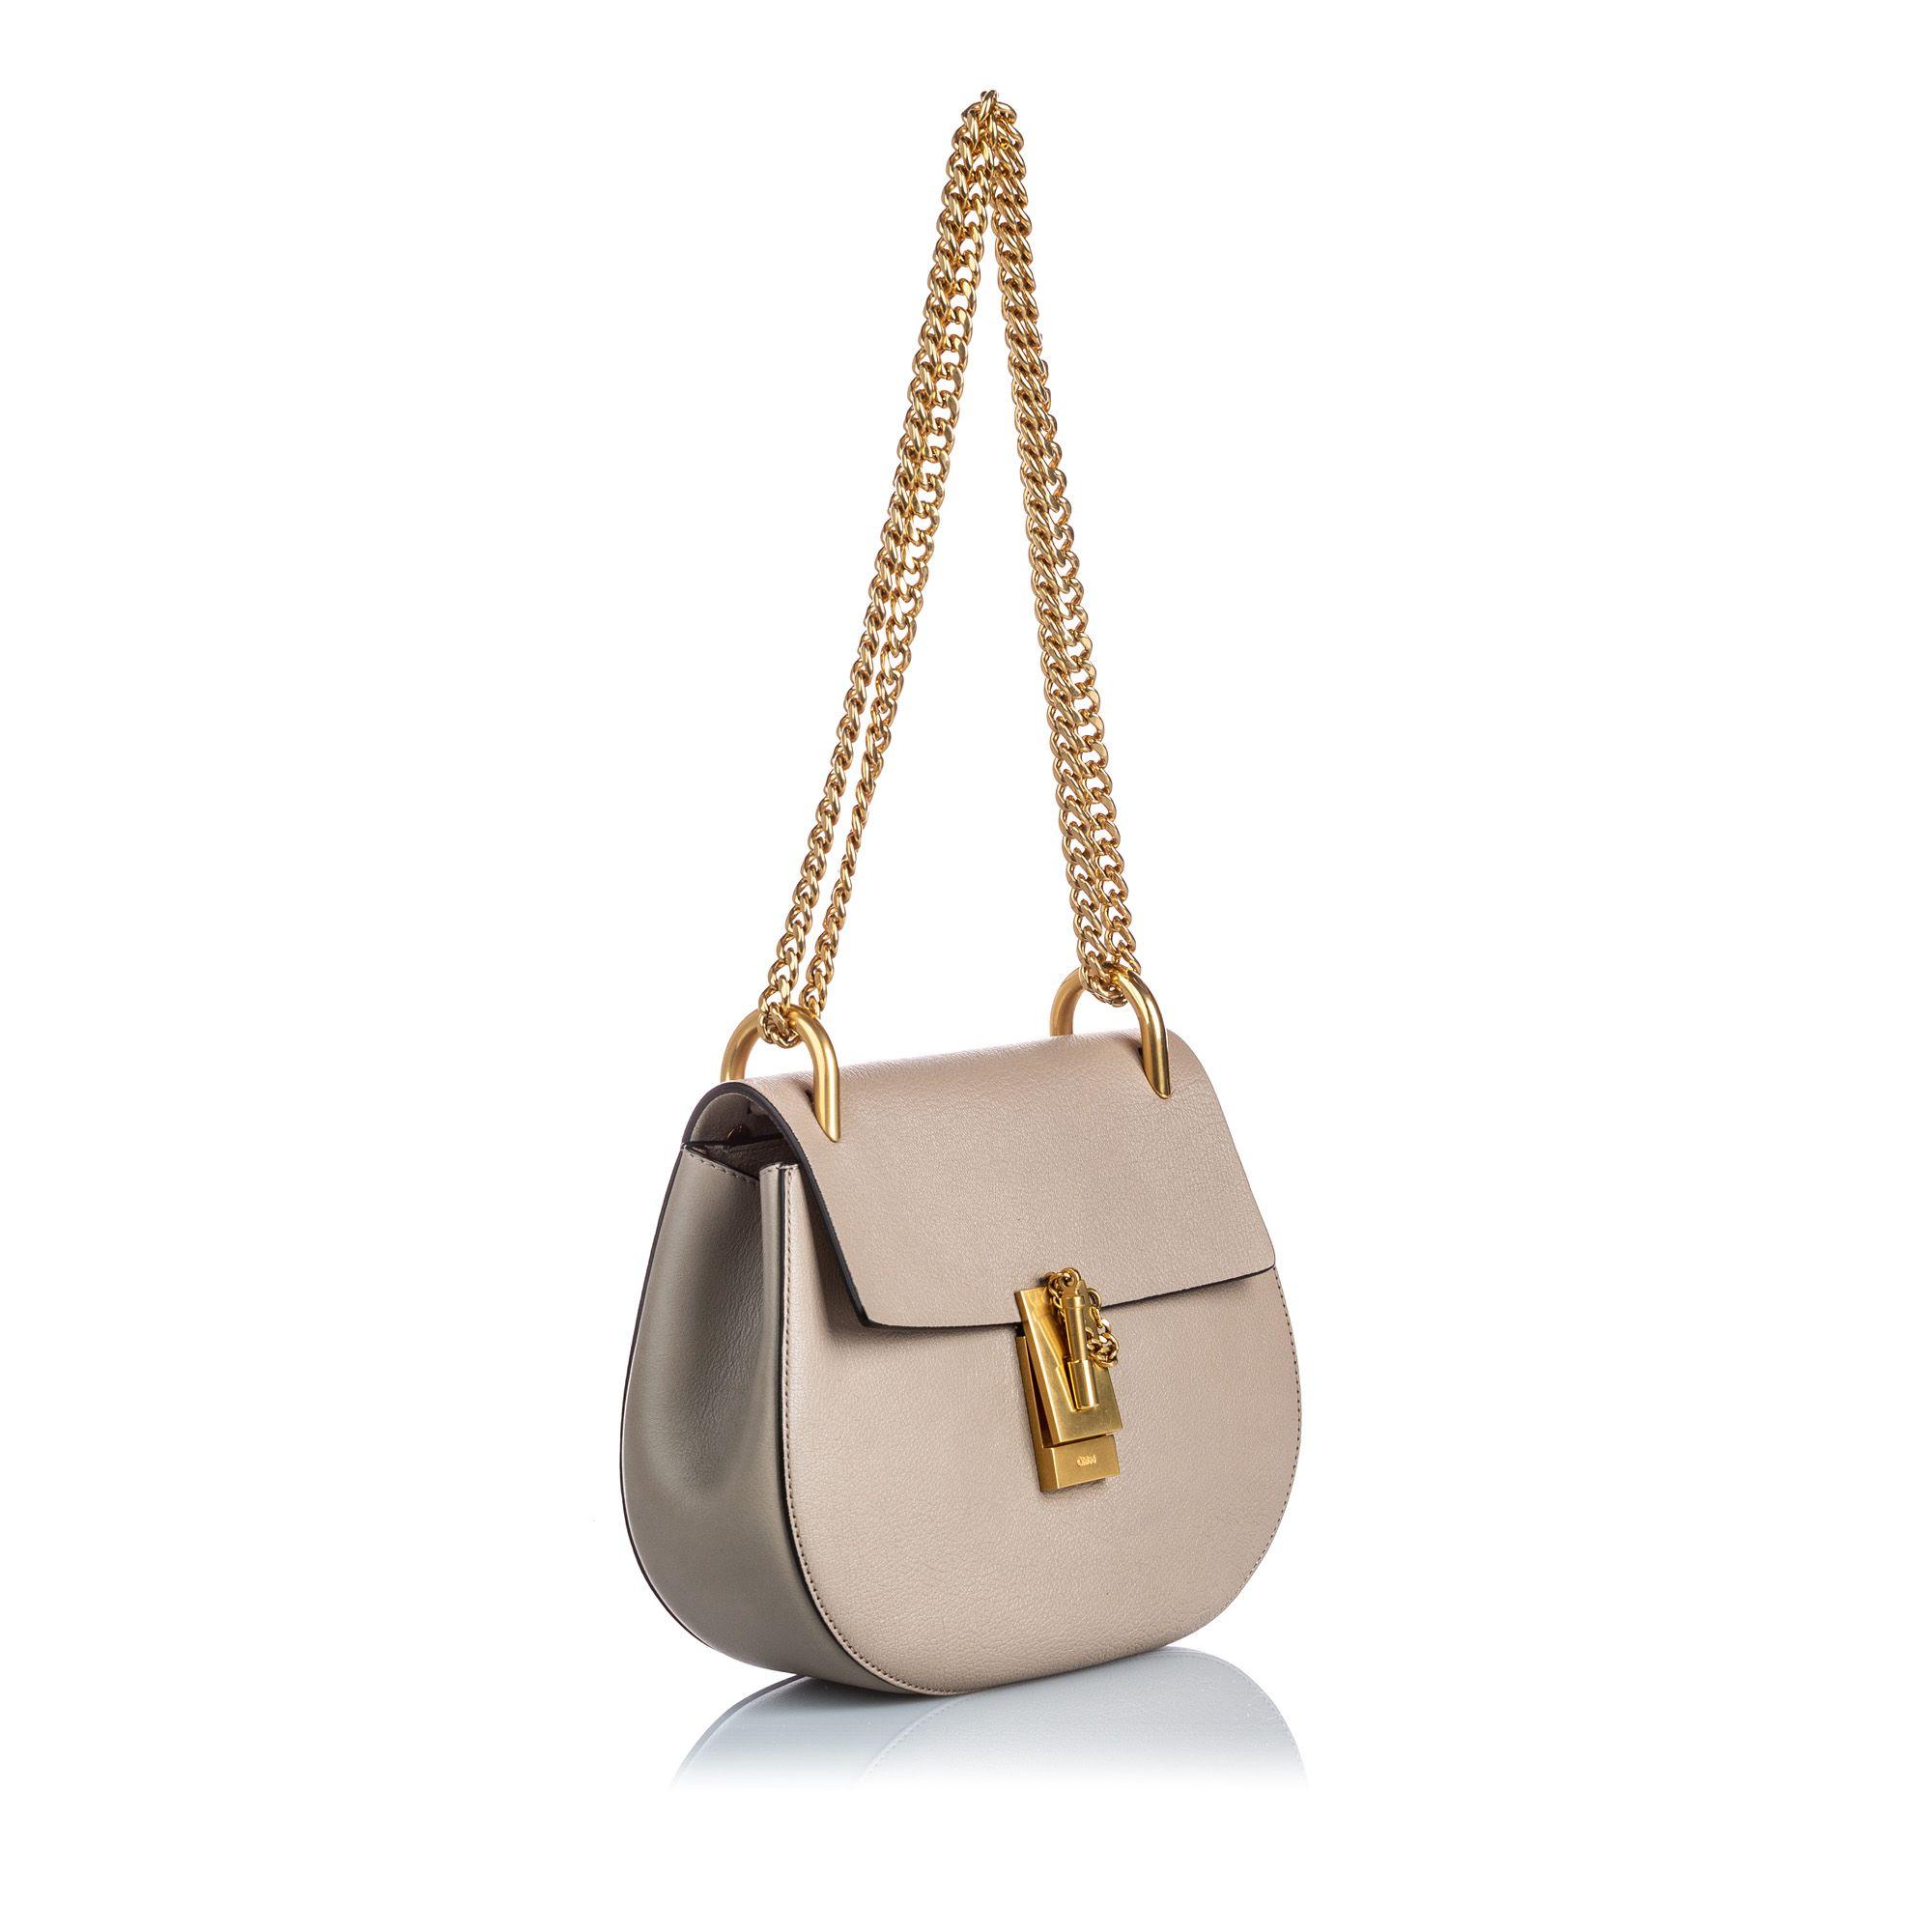 Vintage Chloe Leather Drew Crossbody Bag Gray